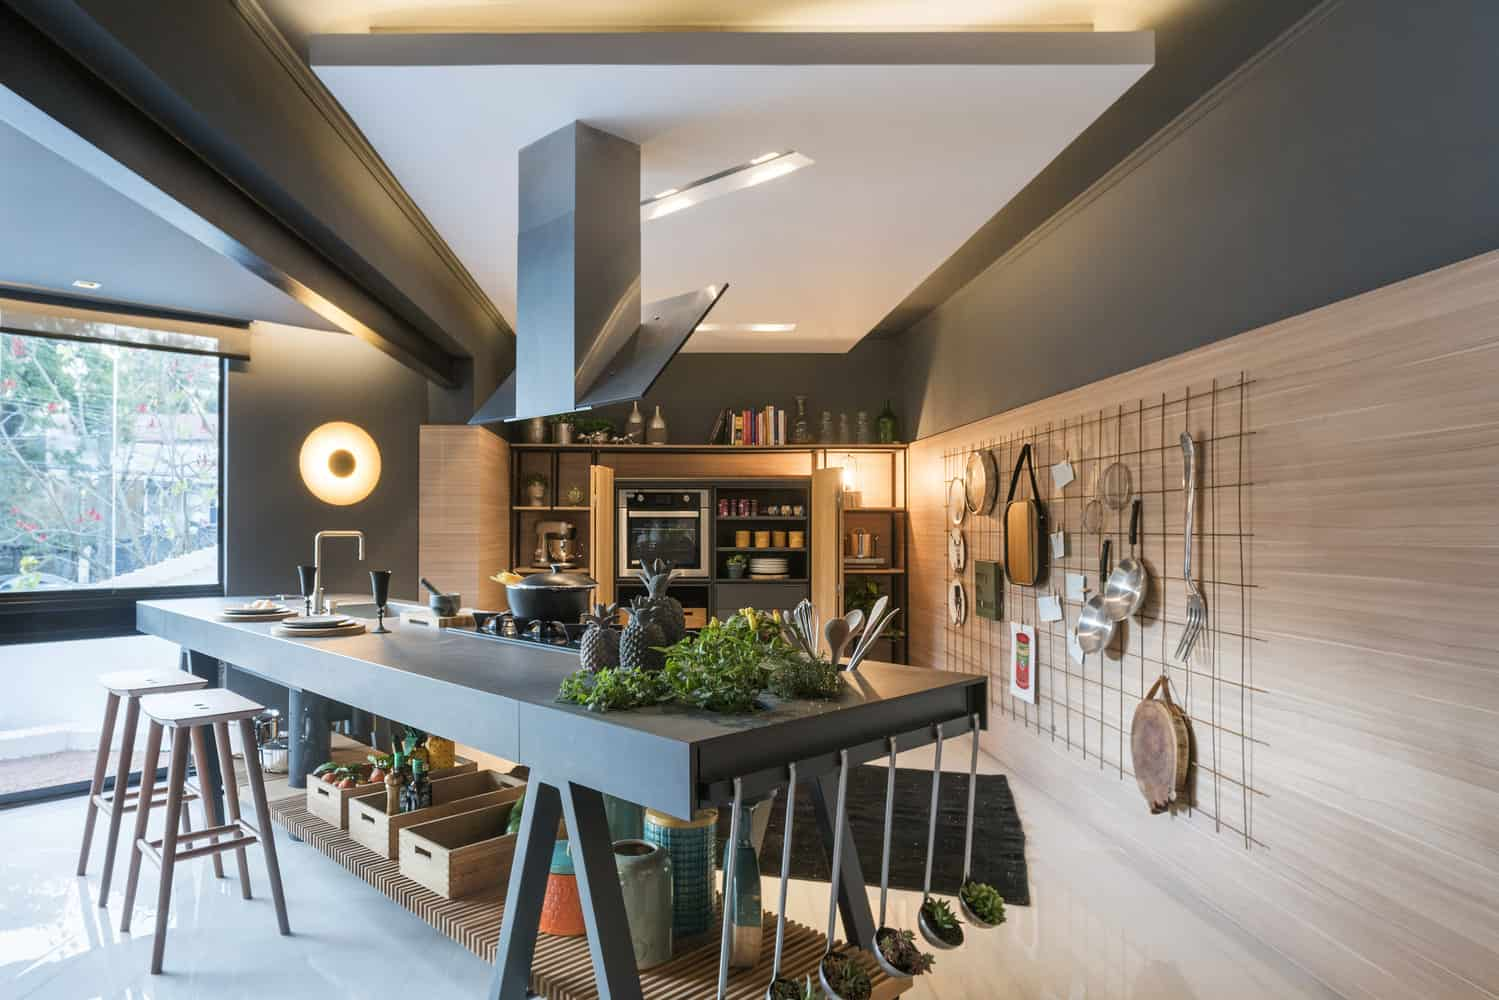 Black modern kitchen with no cabinets